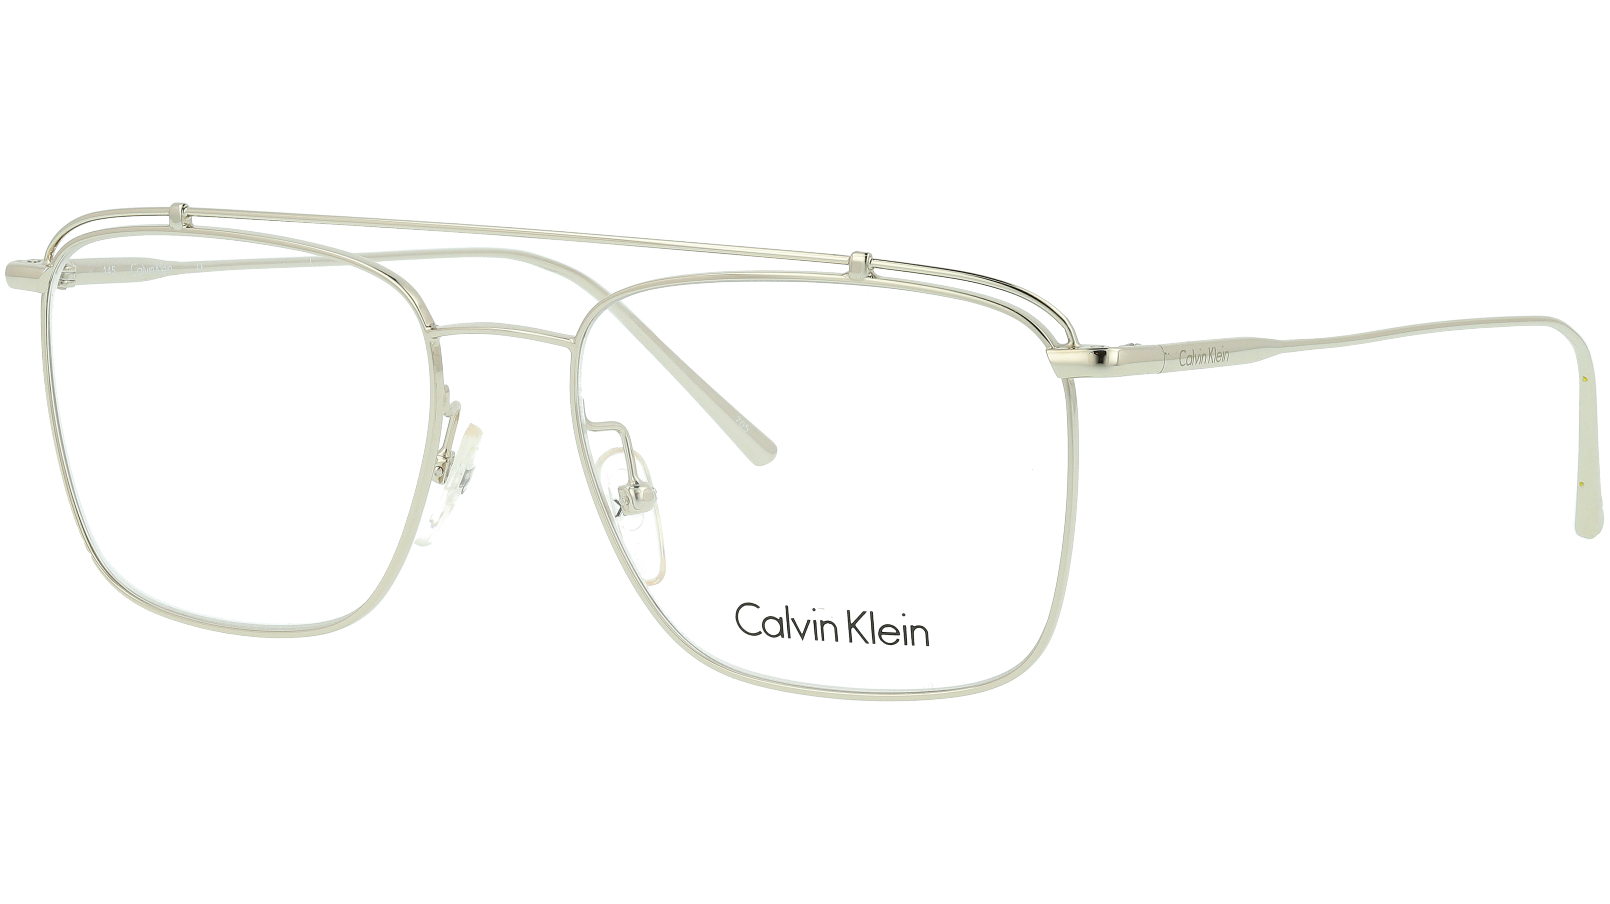 Calvin Klein CK5461 046 55 Silver Glasses